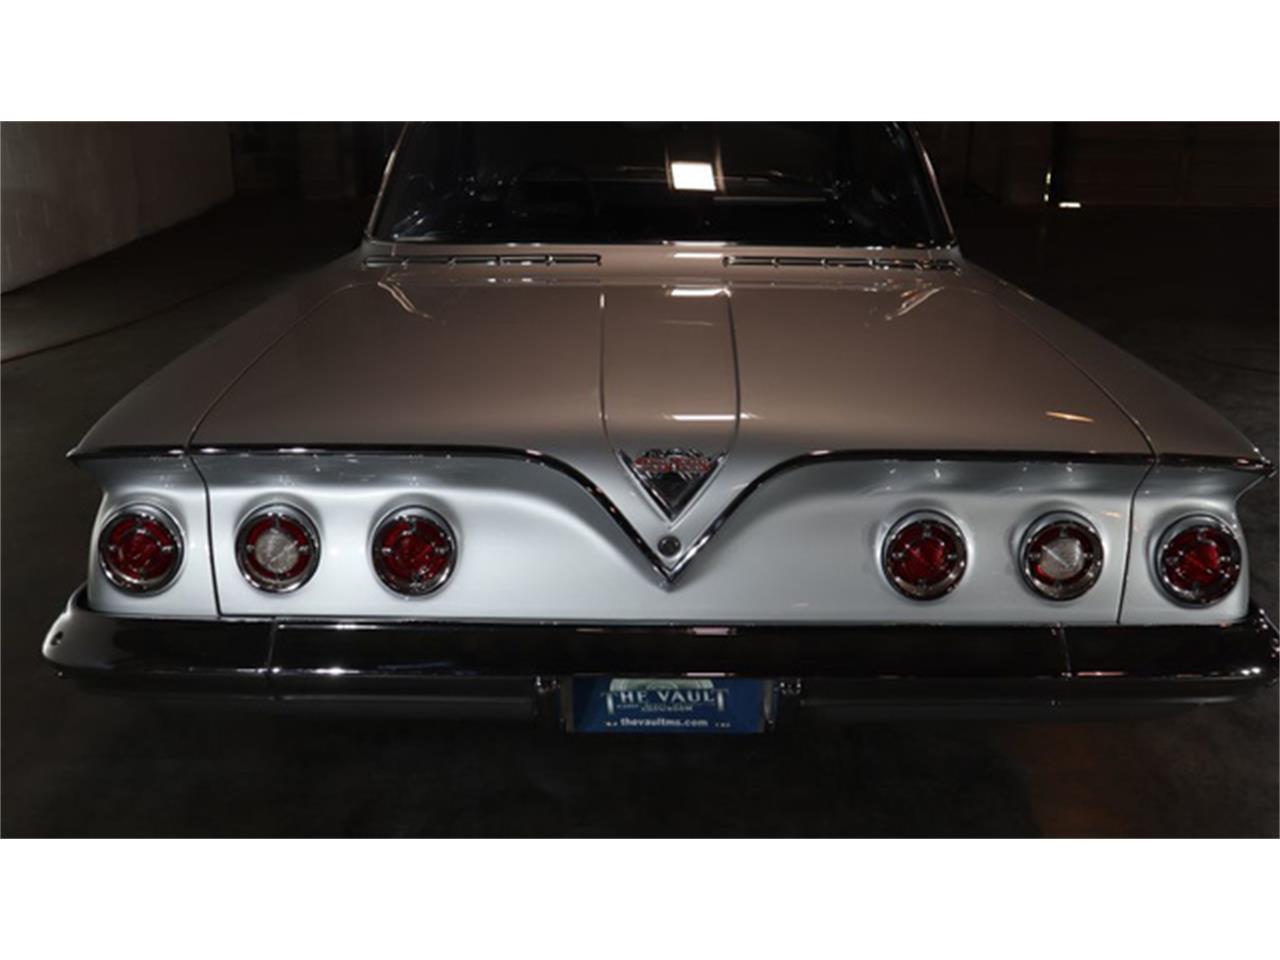 1961 Chevrolet Impala (CC-1414377) for sale in Jackson, Mississippi